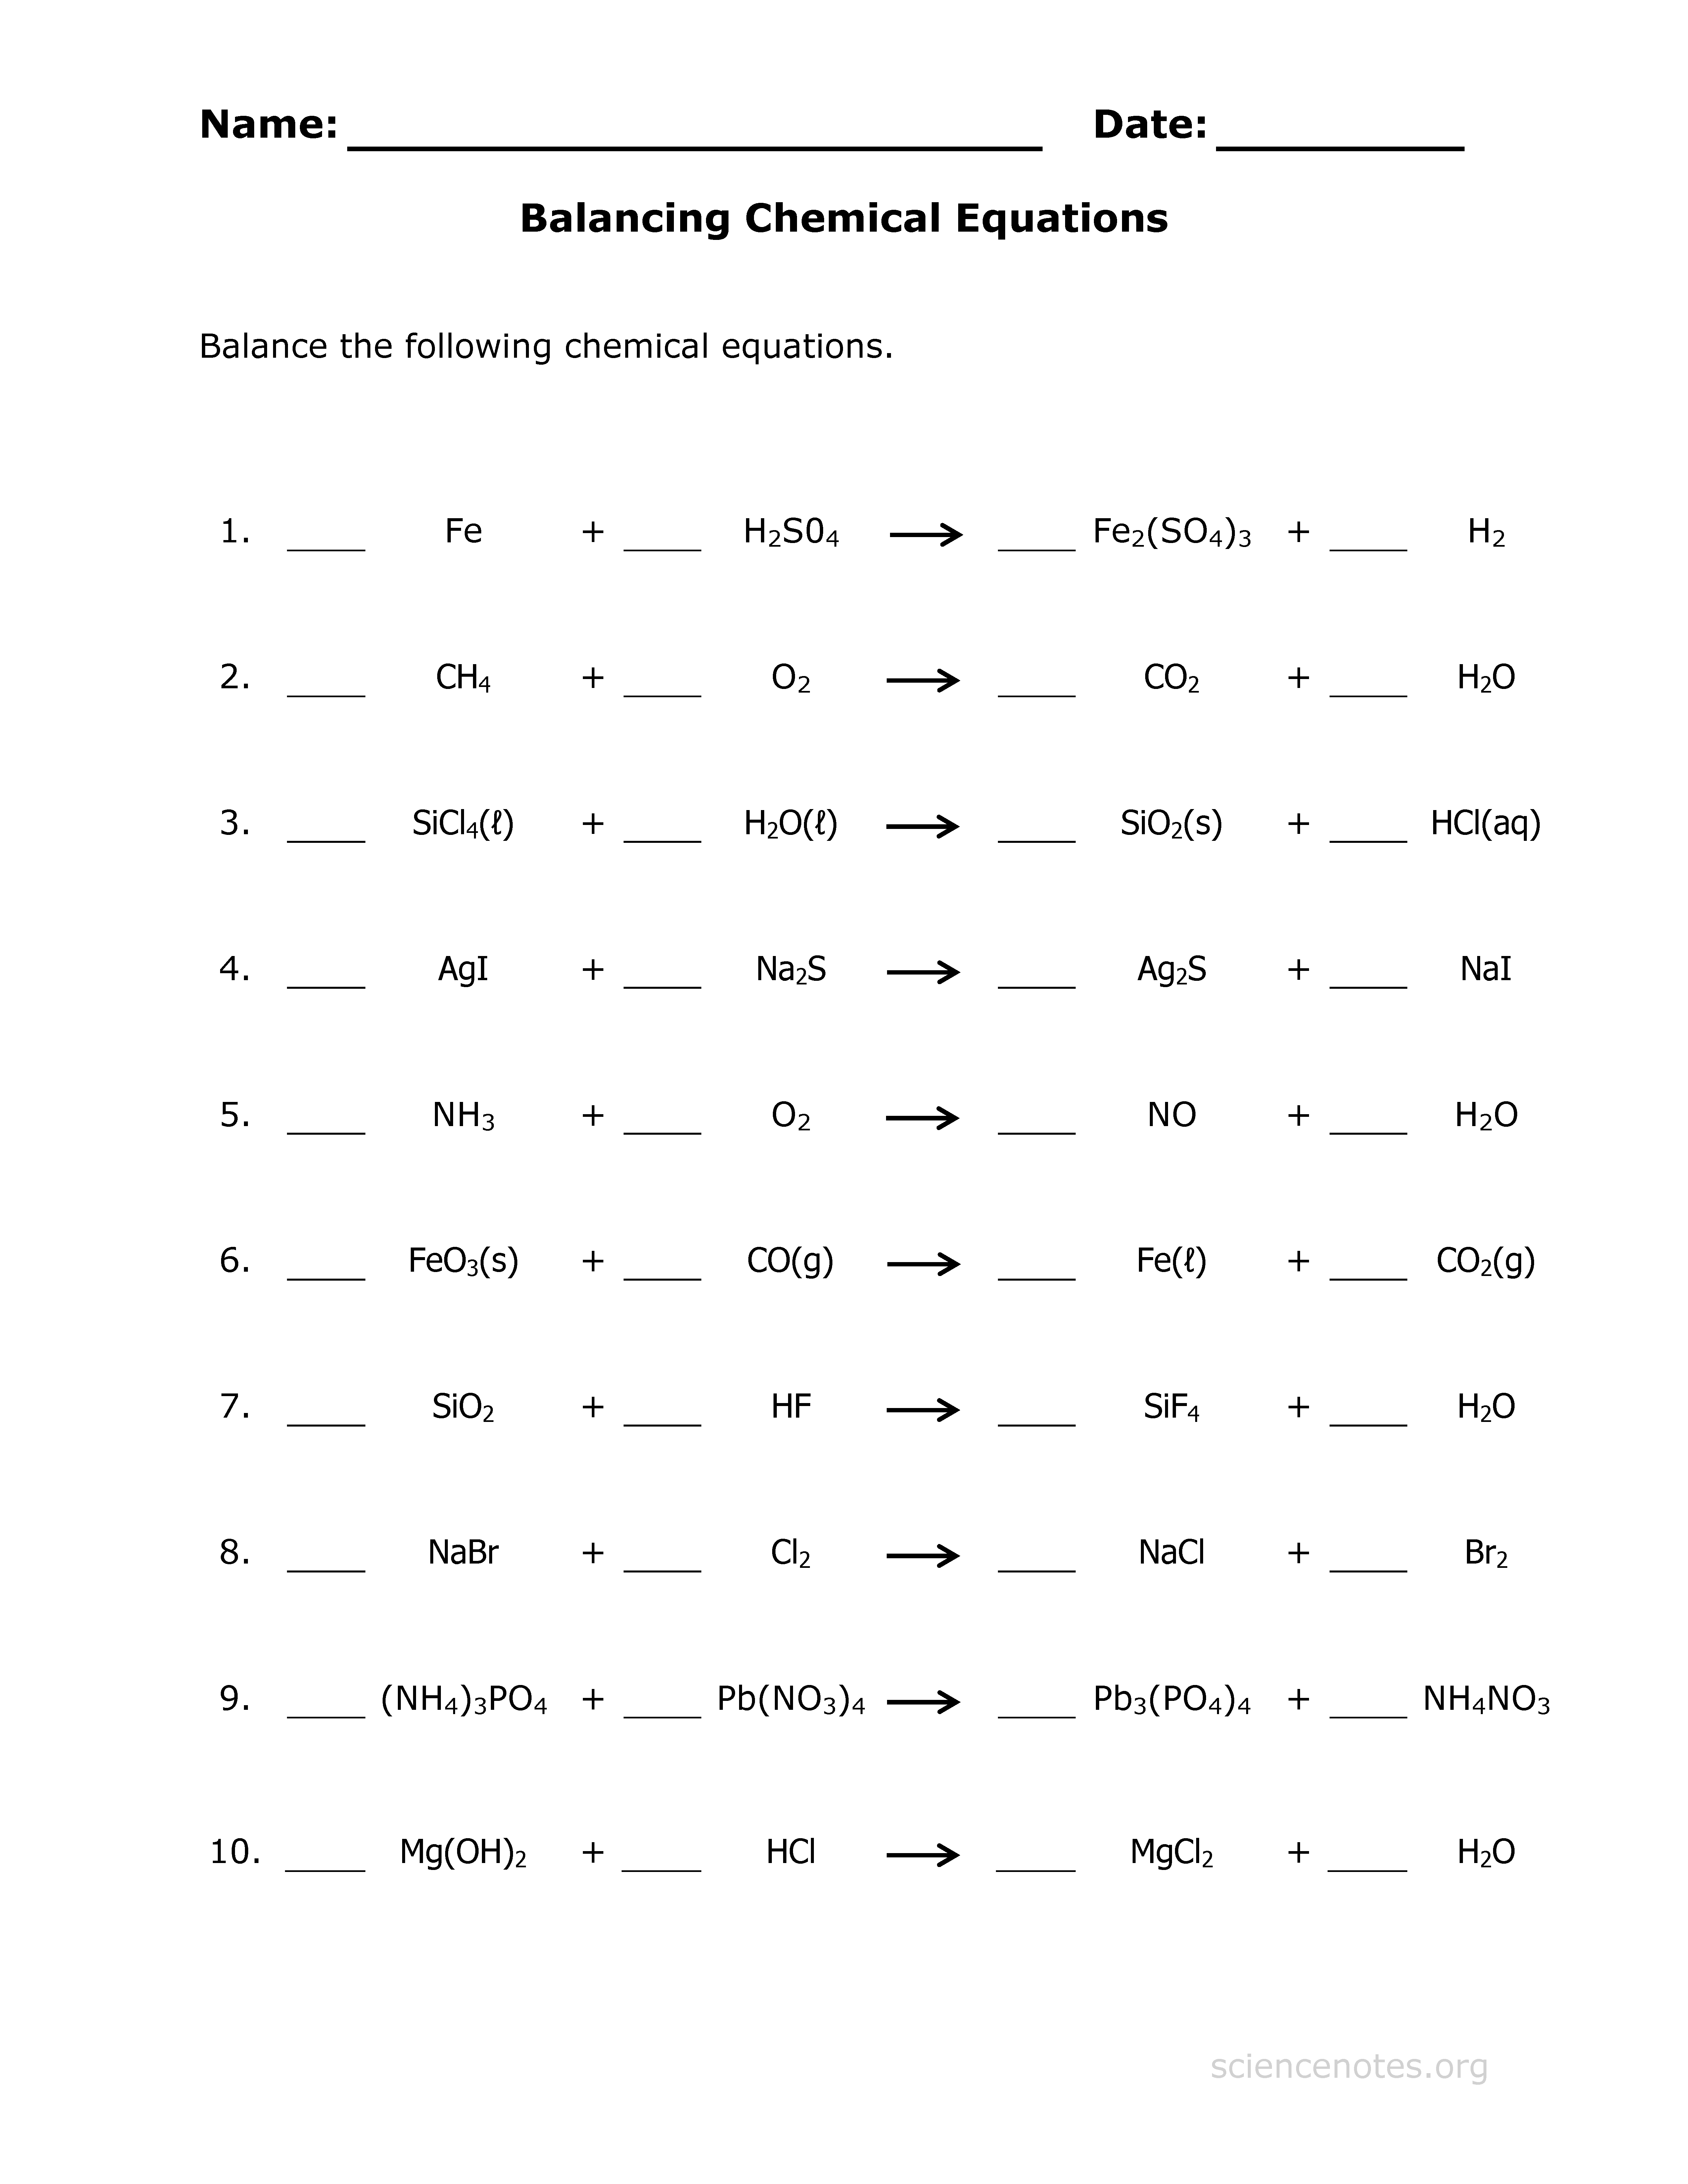 Balancing Chemical Equations Worksheet For 6th Grade